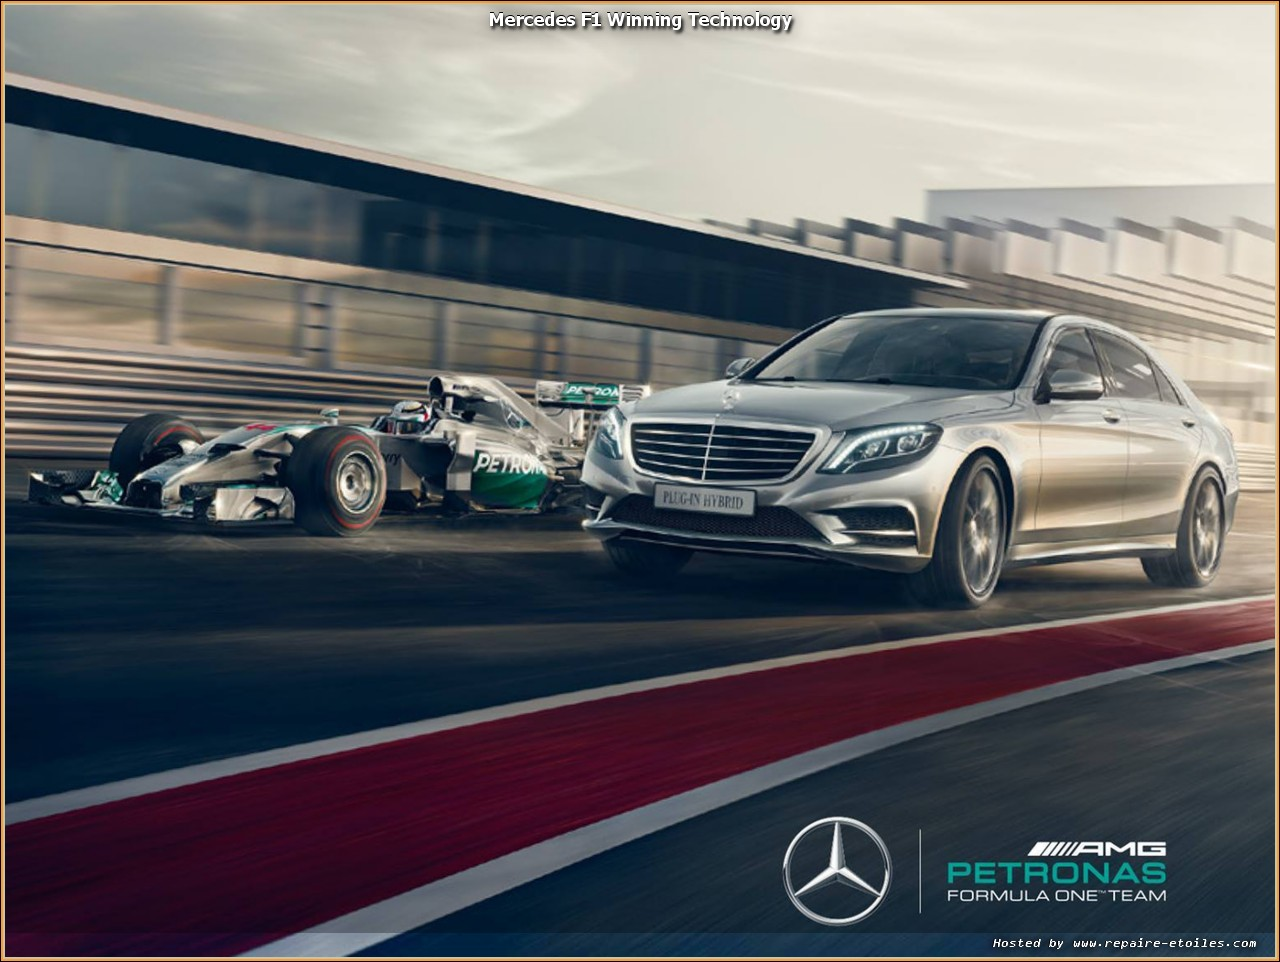 Technologie F1